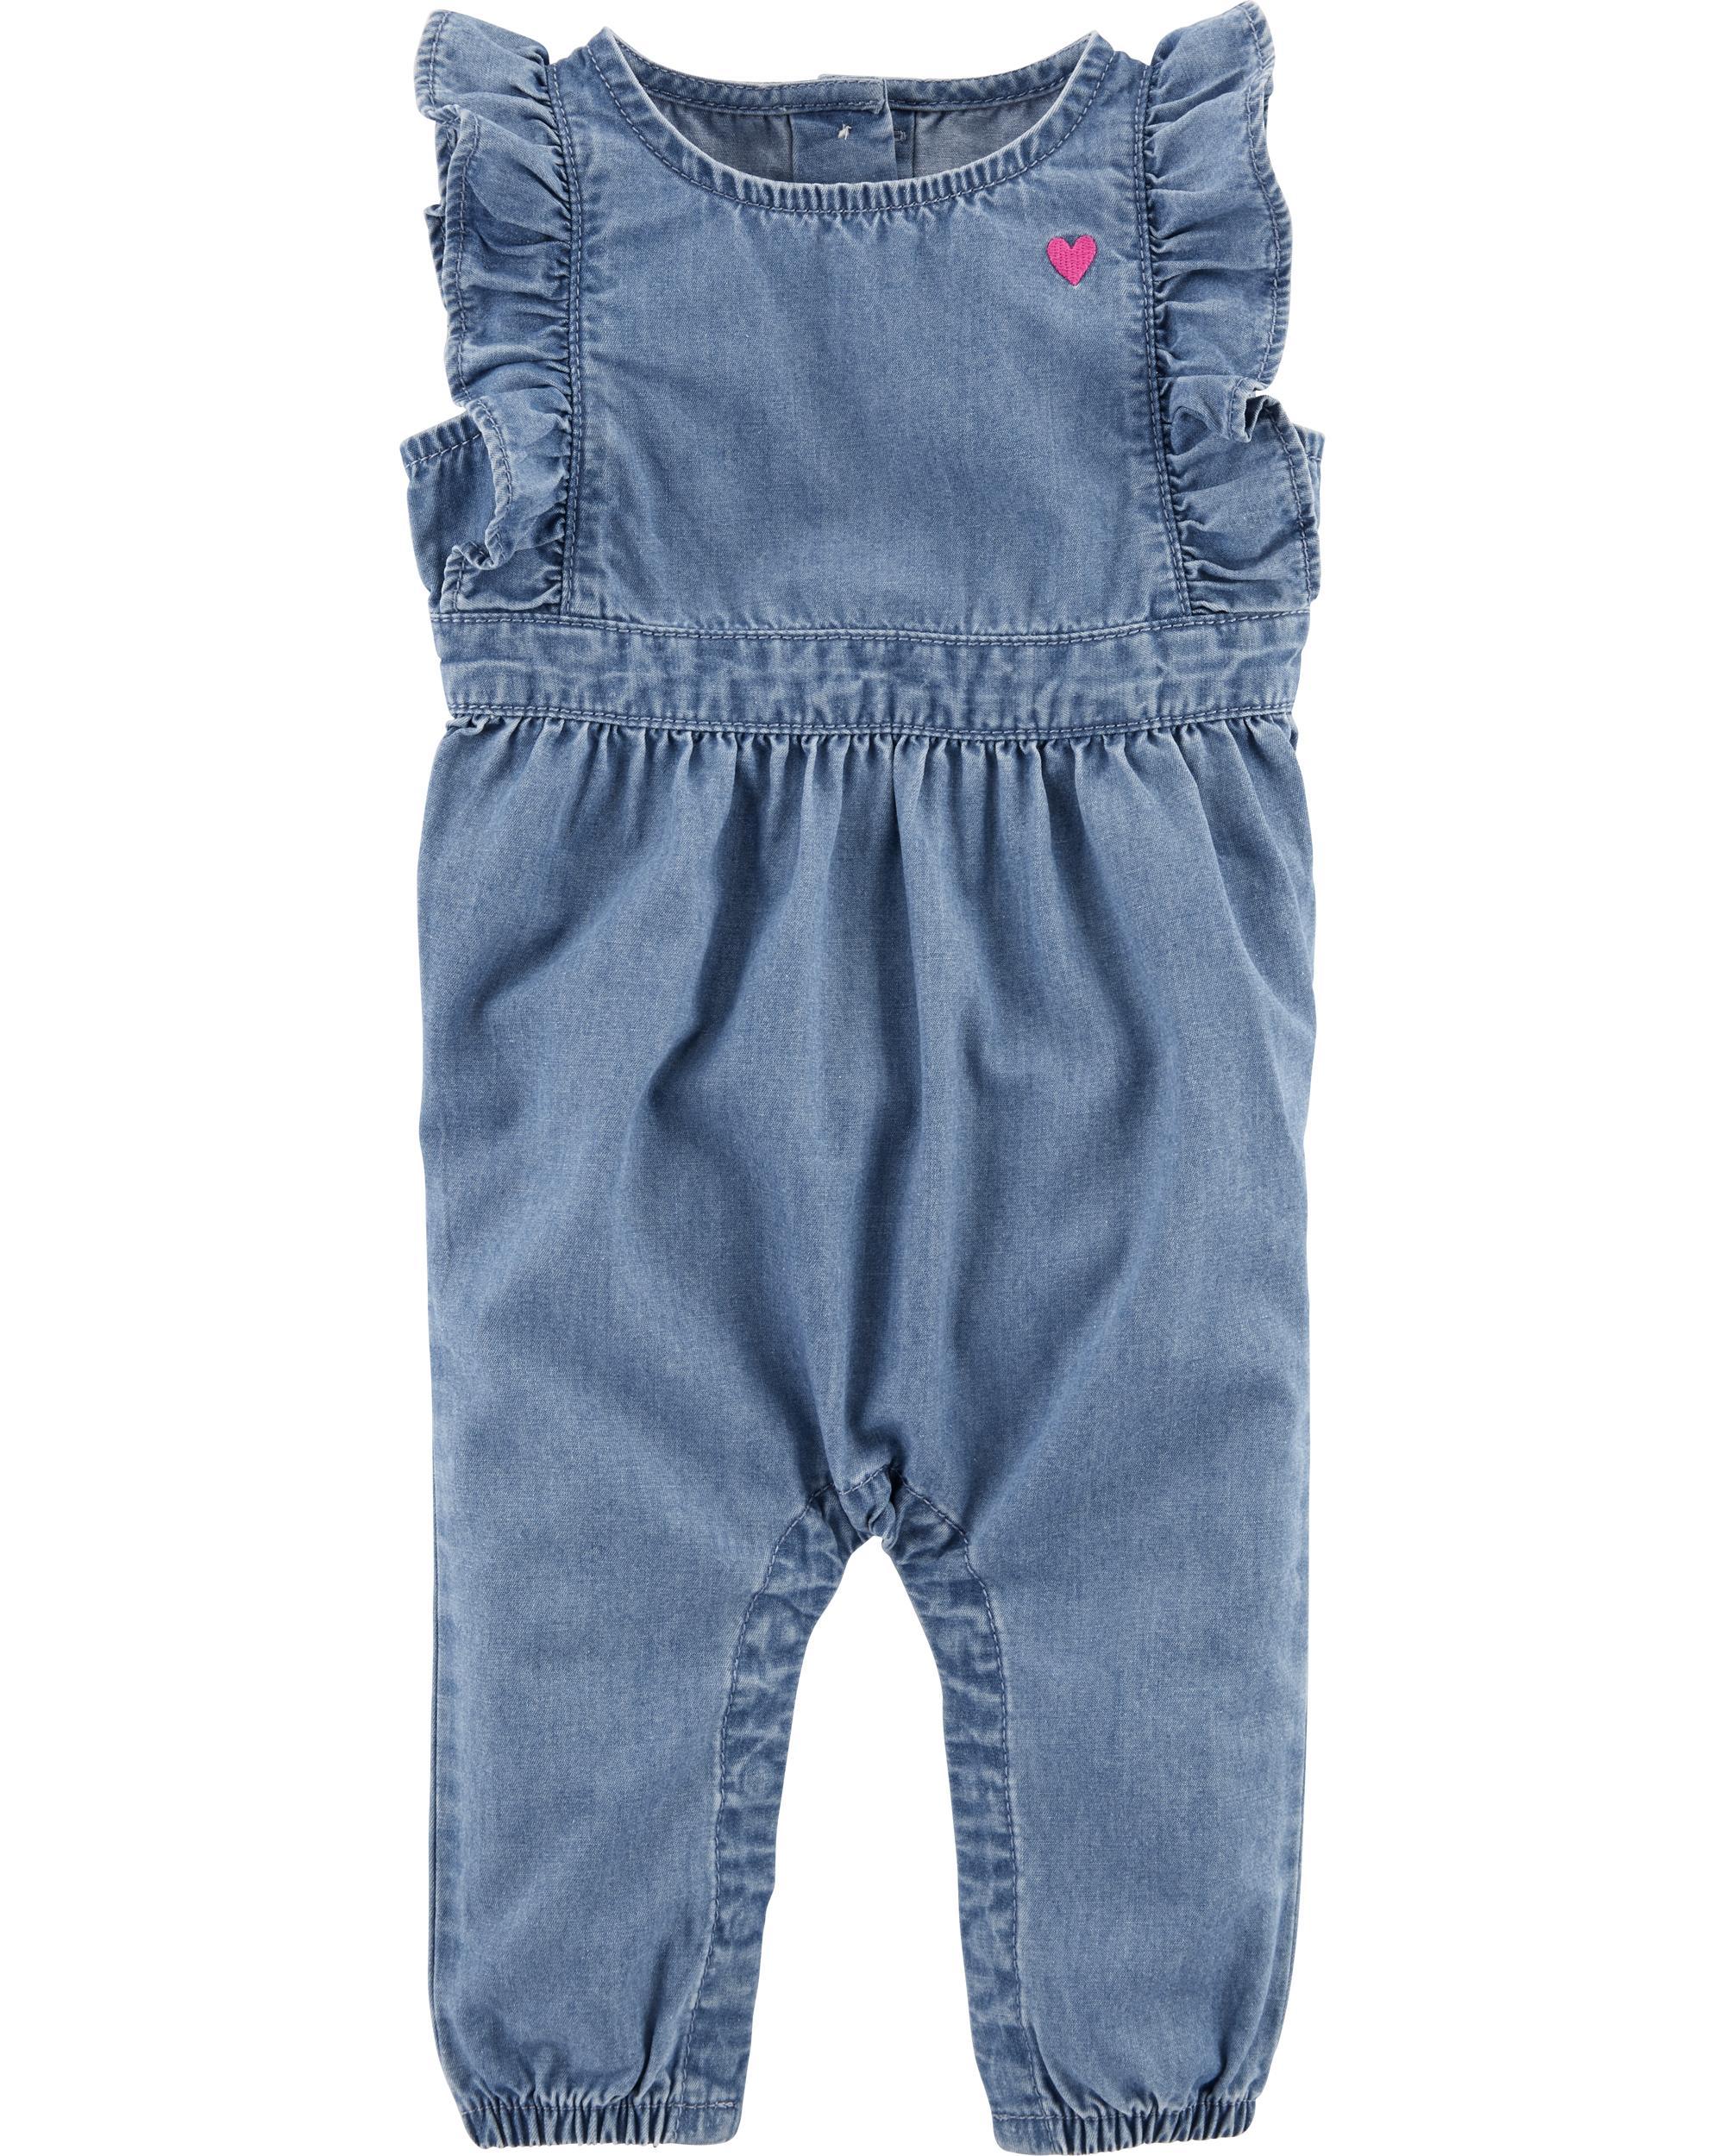 JVNSS Peace Sign Shirt Soft Kids Flounced T Shirts Clothes for 2-6T Kids Girls